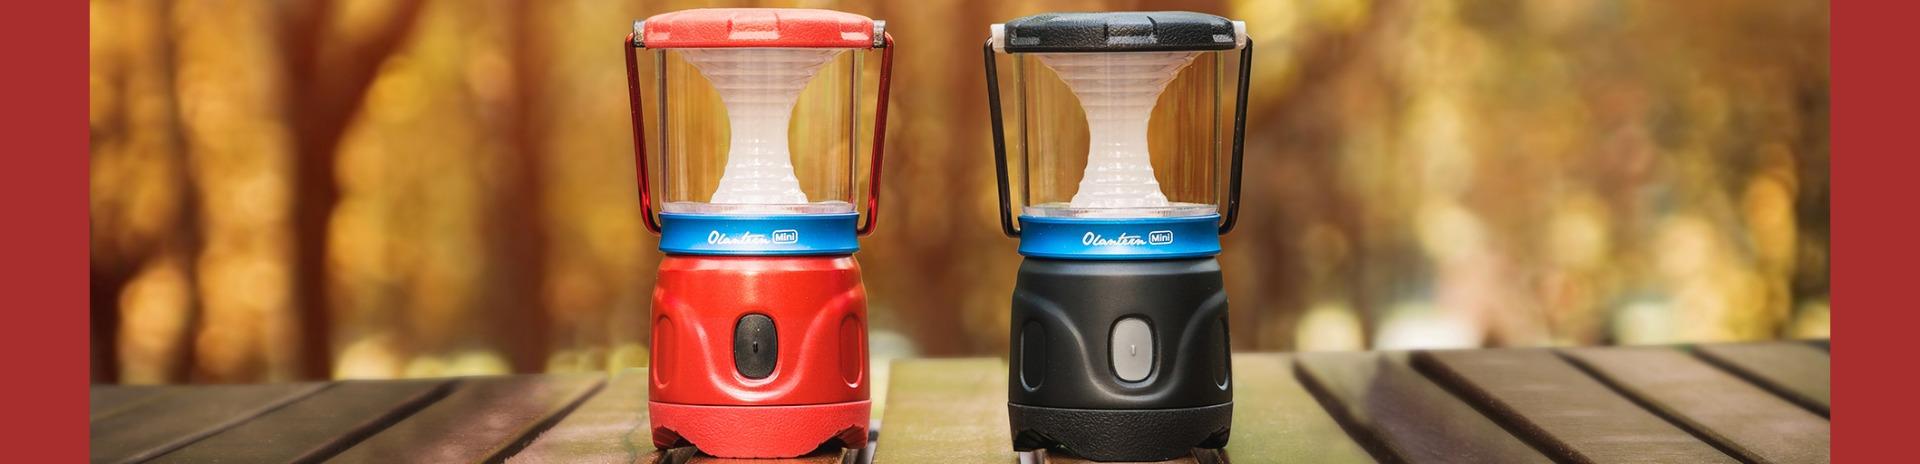 Olantern Mini——Camp Lights Is Not An Impractical Tool